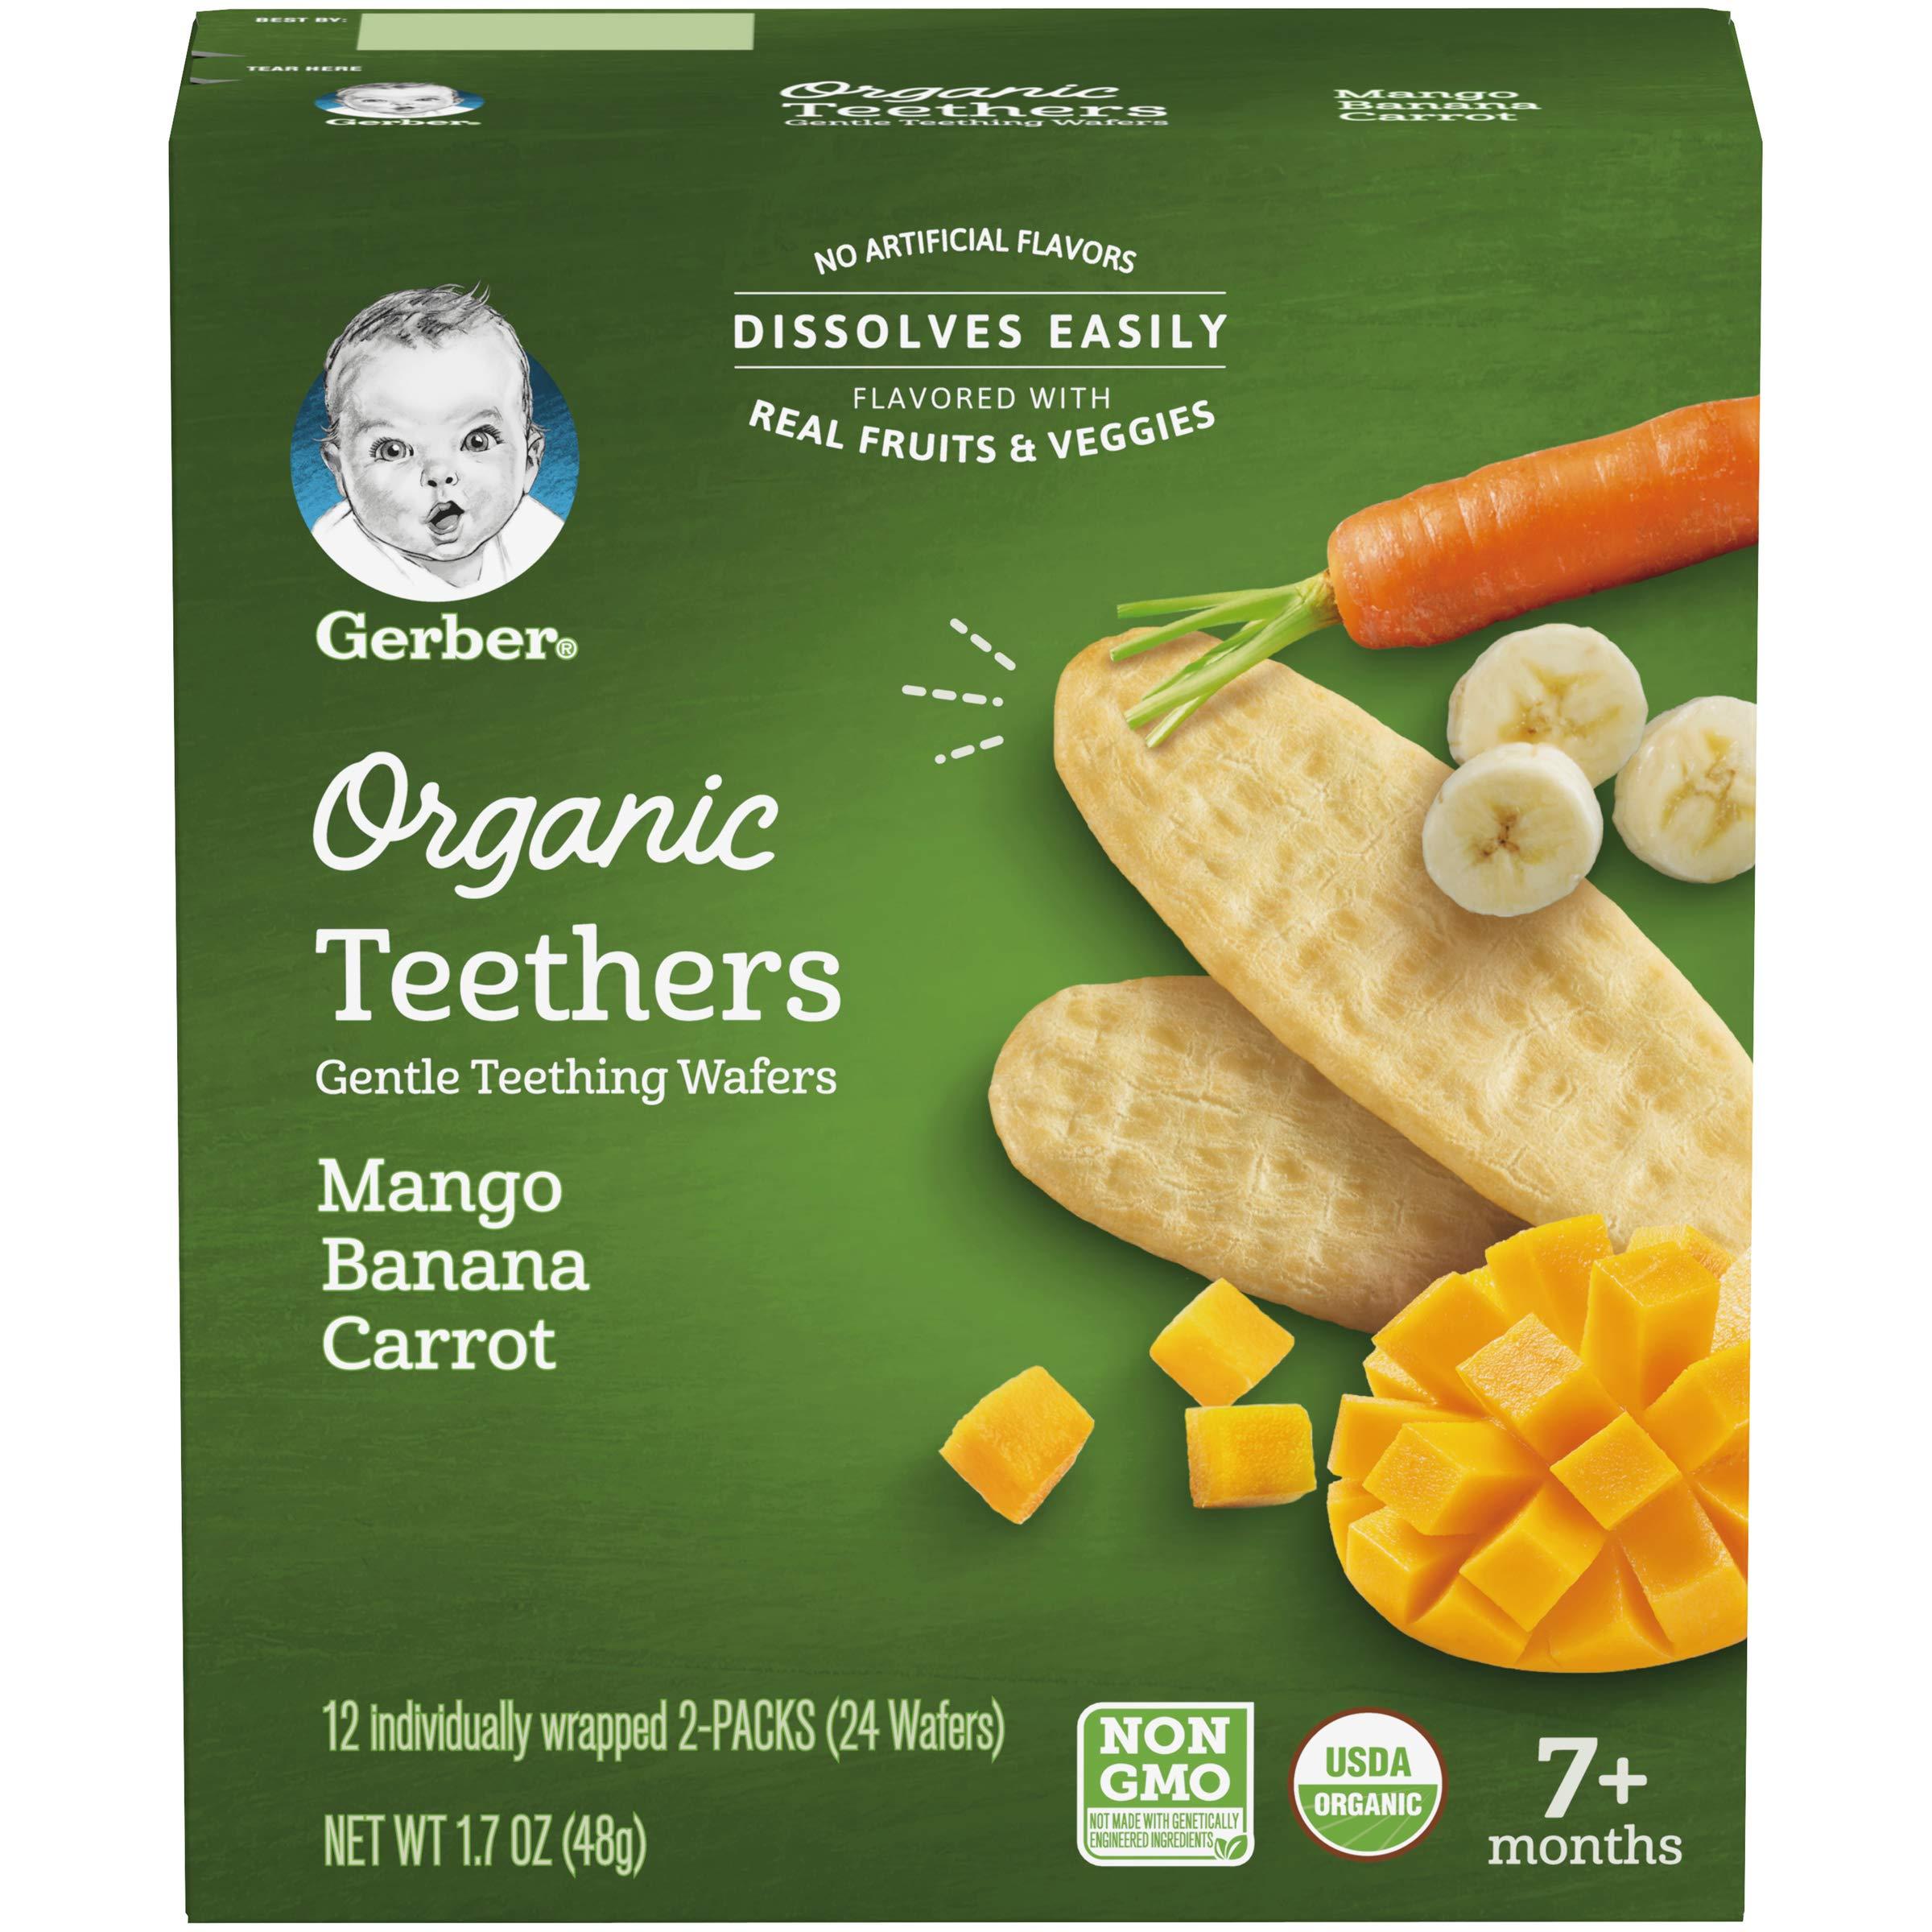 Gerber Organic Teethers, Mango Banana Carrot, 12 count Box, 1.7 Oz